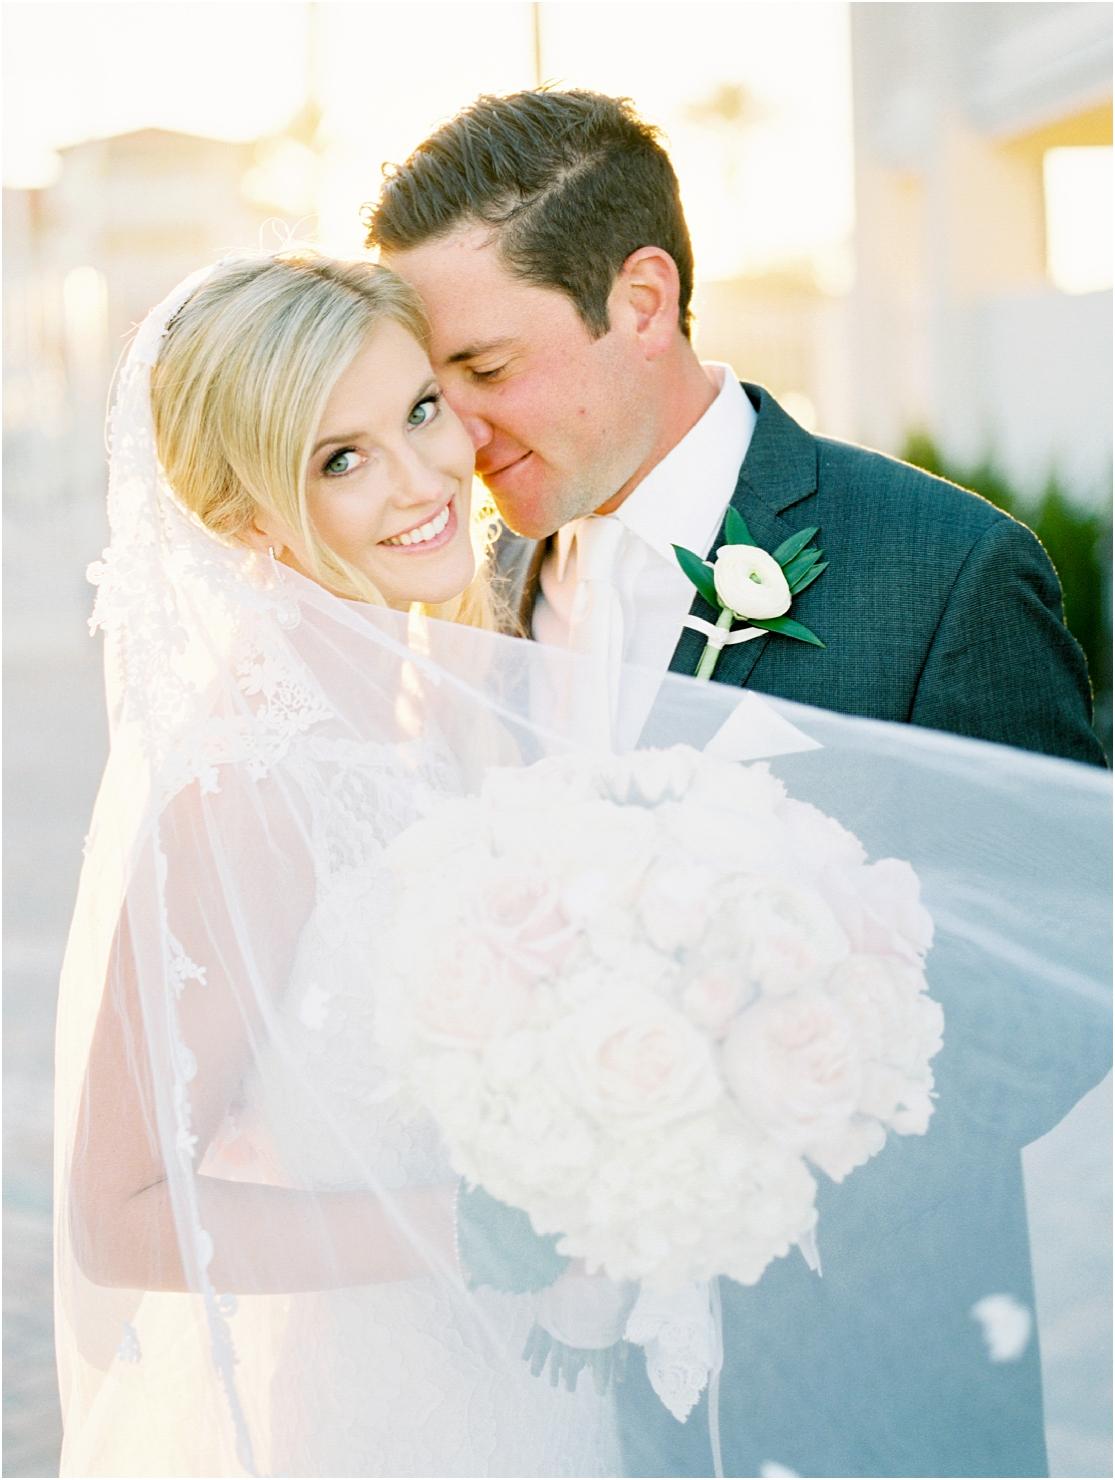 Lisa Silva Photography- Ponte Vedra Beach and Jacksonville, Florida Fine Art Film Wedding Photography- Wedding at the Ponte Vedra Inn and Club_0065.jpg